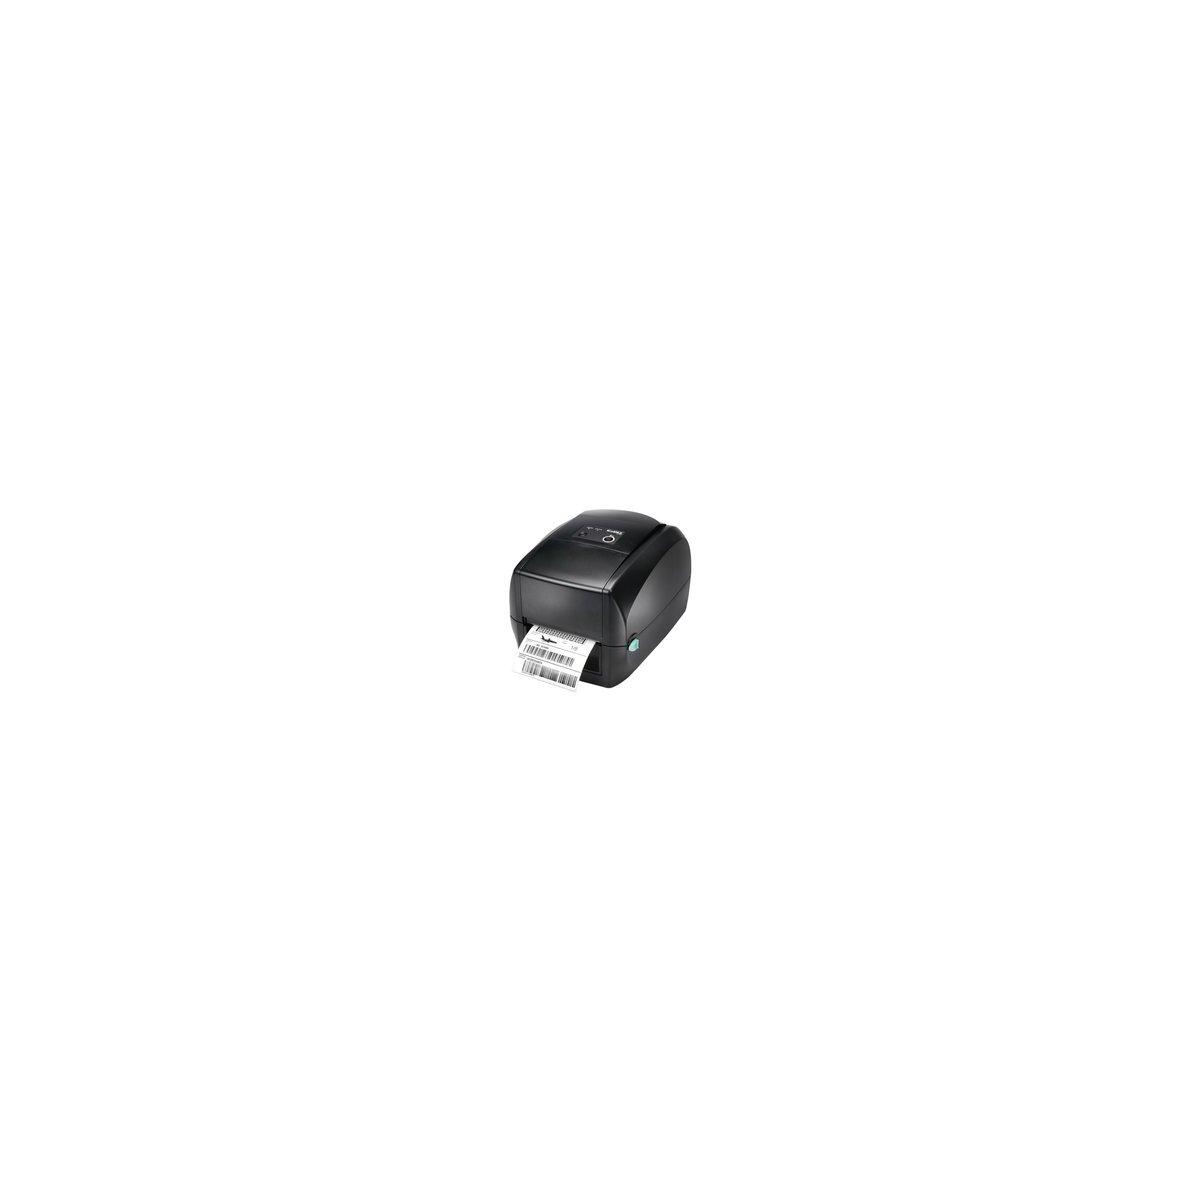 Godex Drucker RT700-200dpi